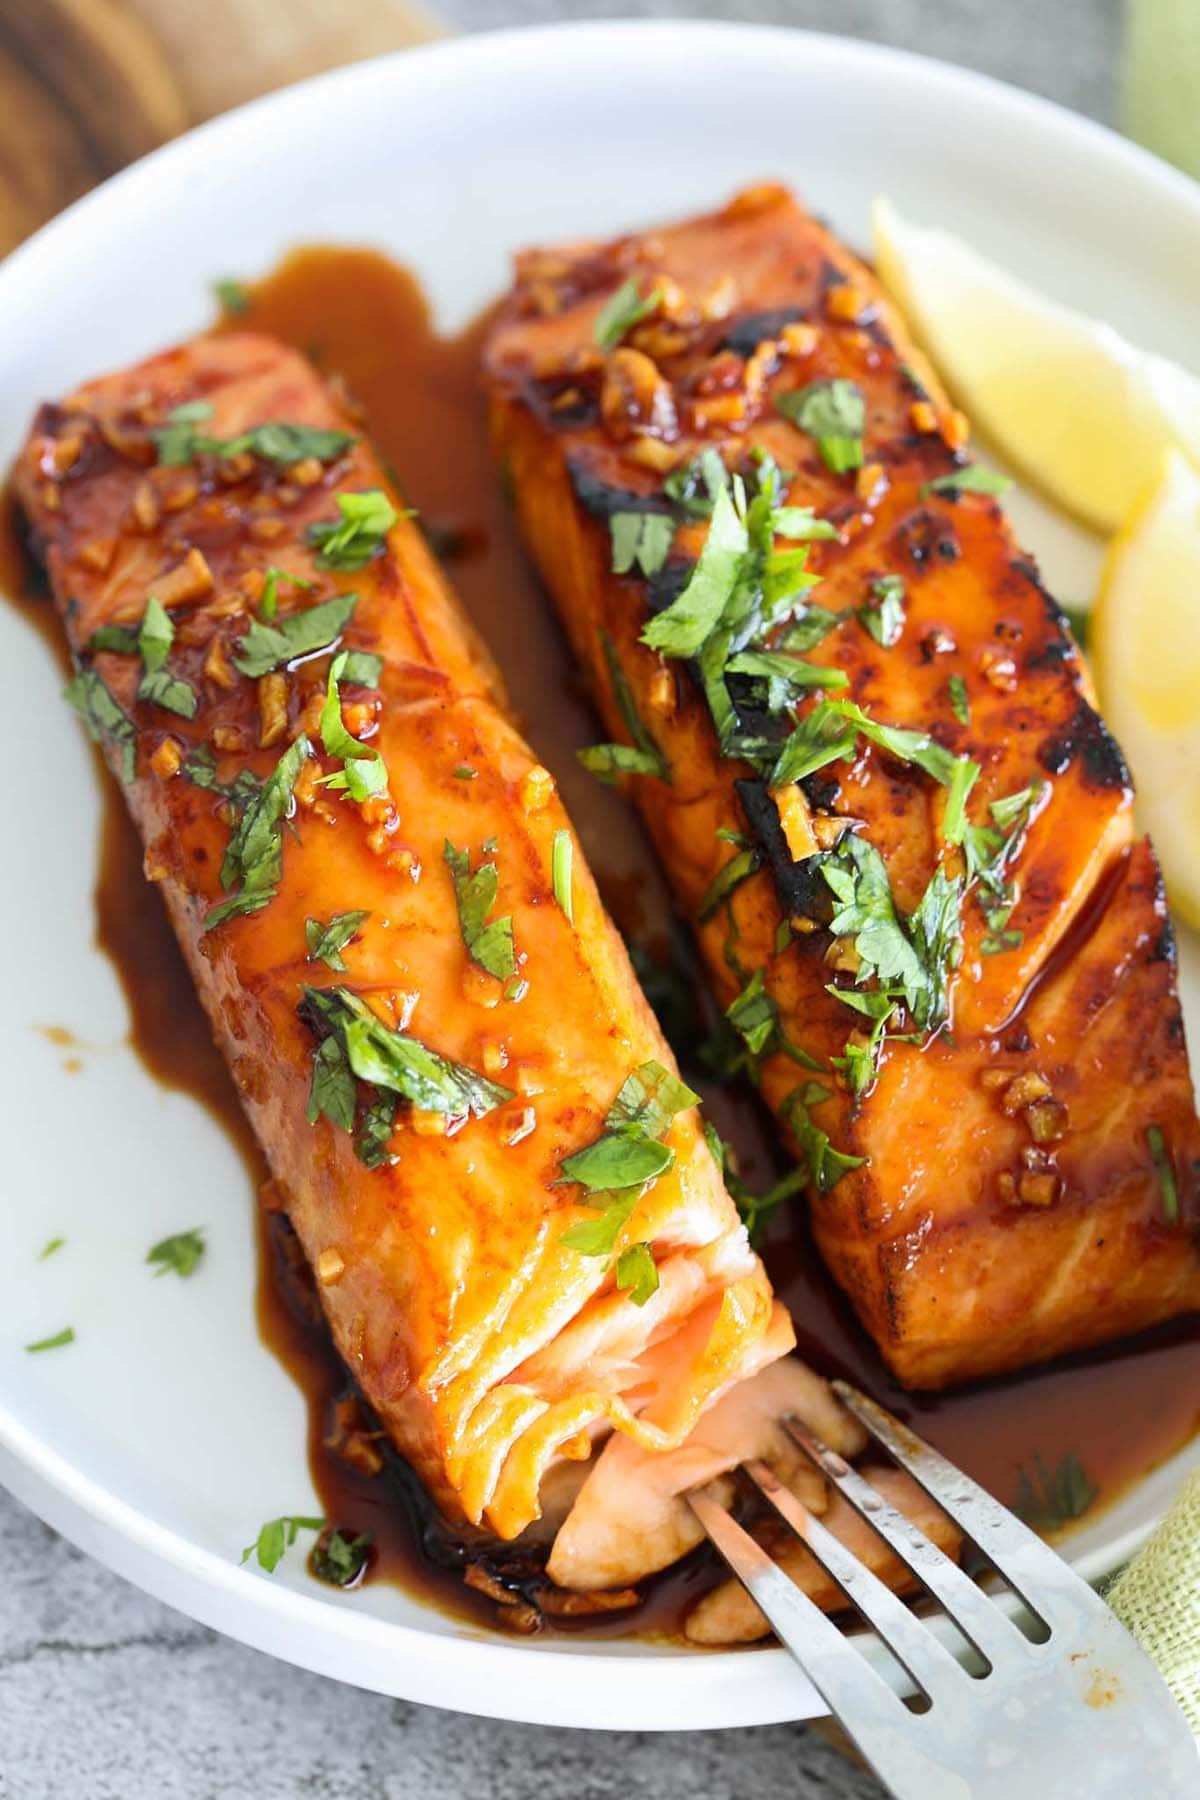 Salmon glaze recipe with honey, sriracha and salmon.